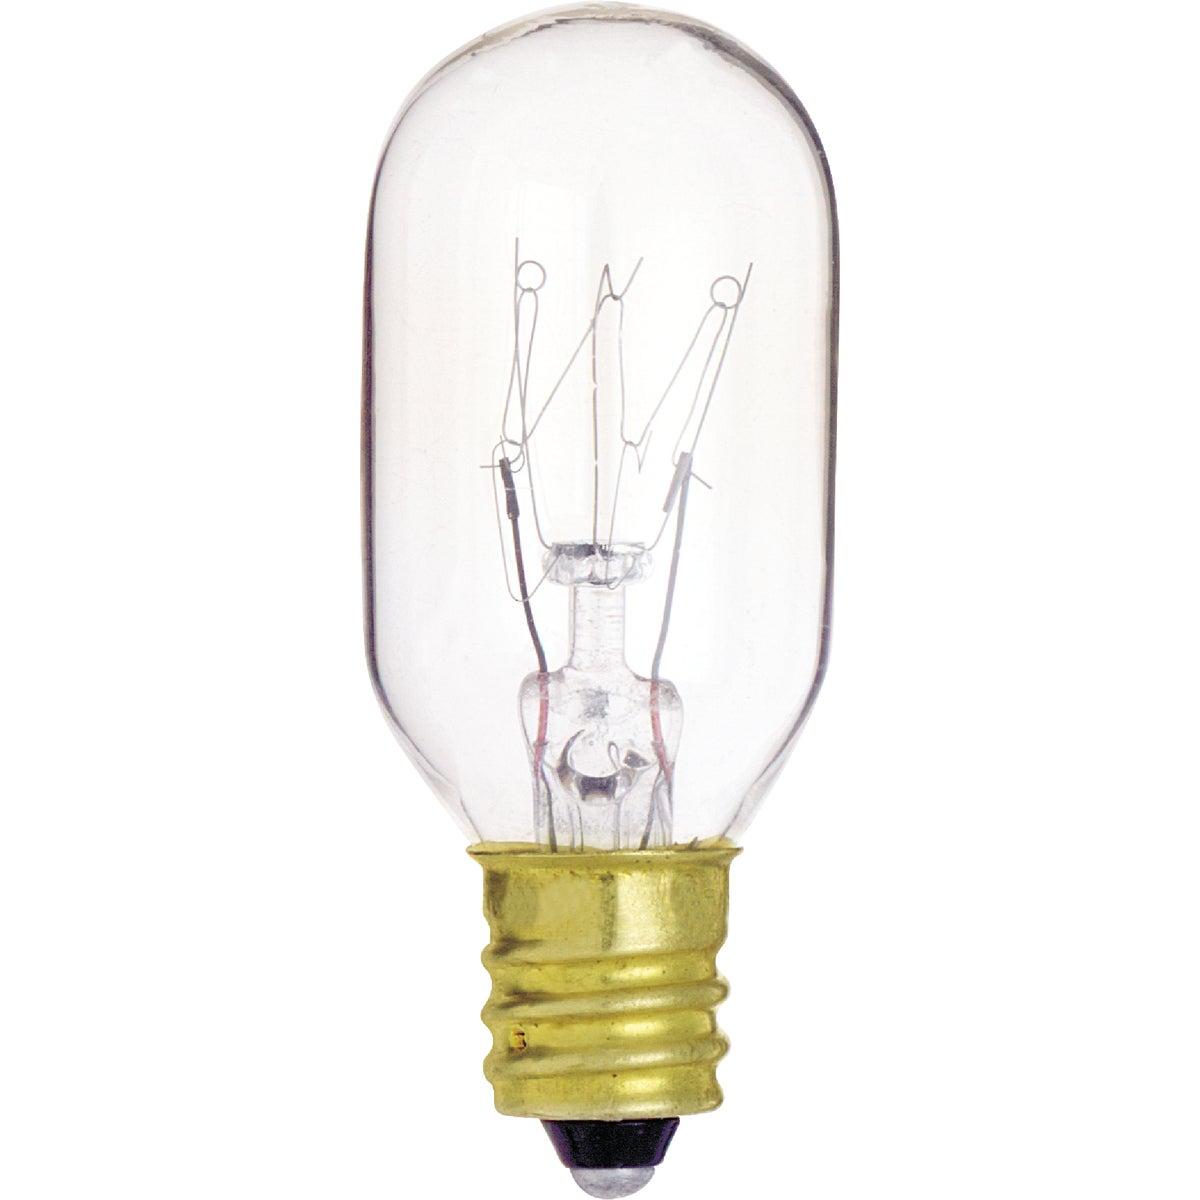 15W CANDELABRA CLR BULB - 03720 by Westinghouse Lightng